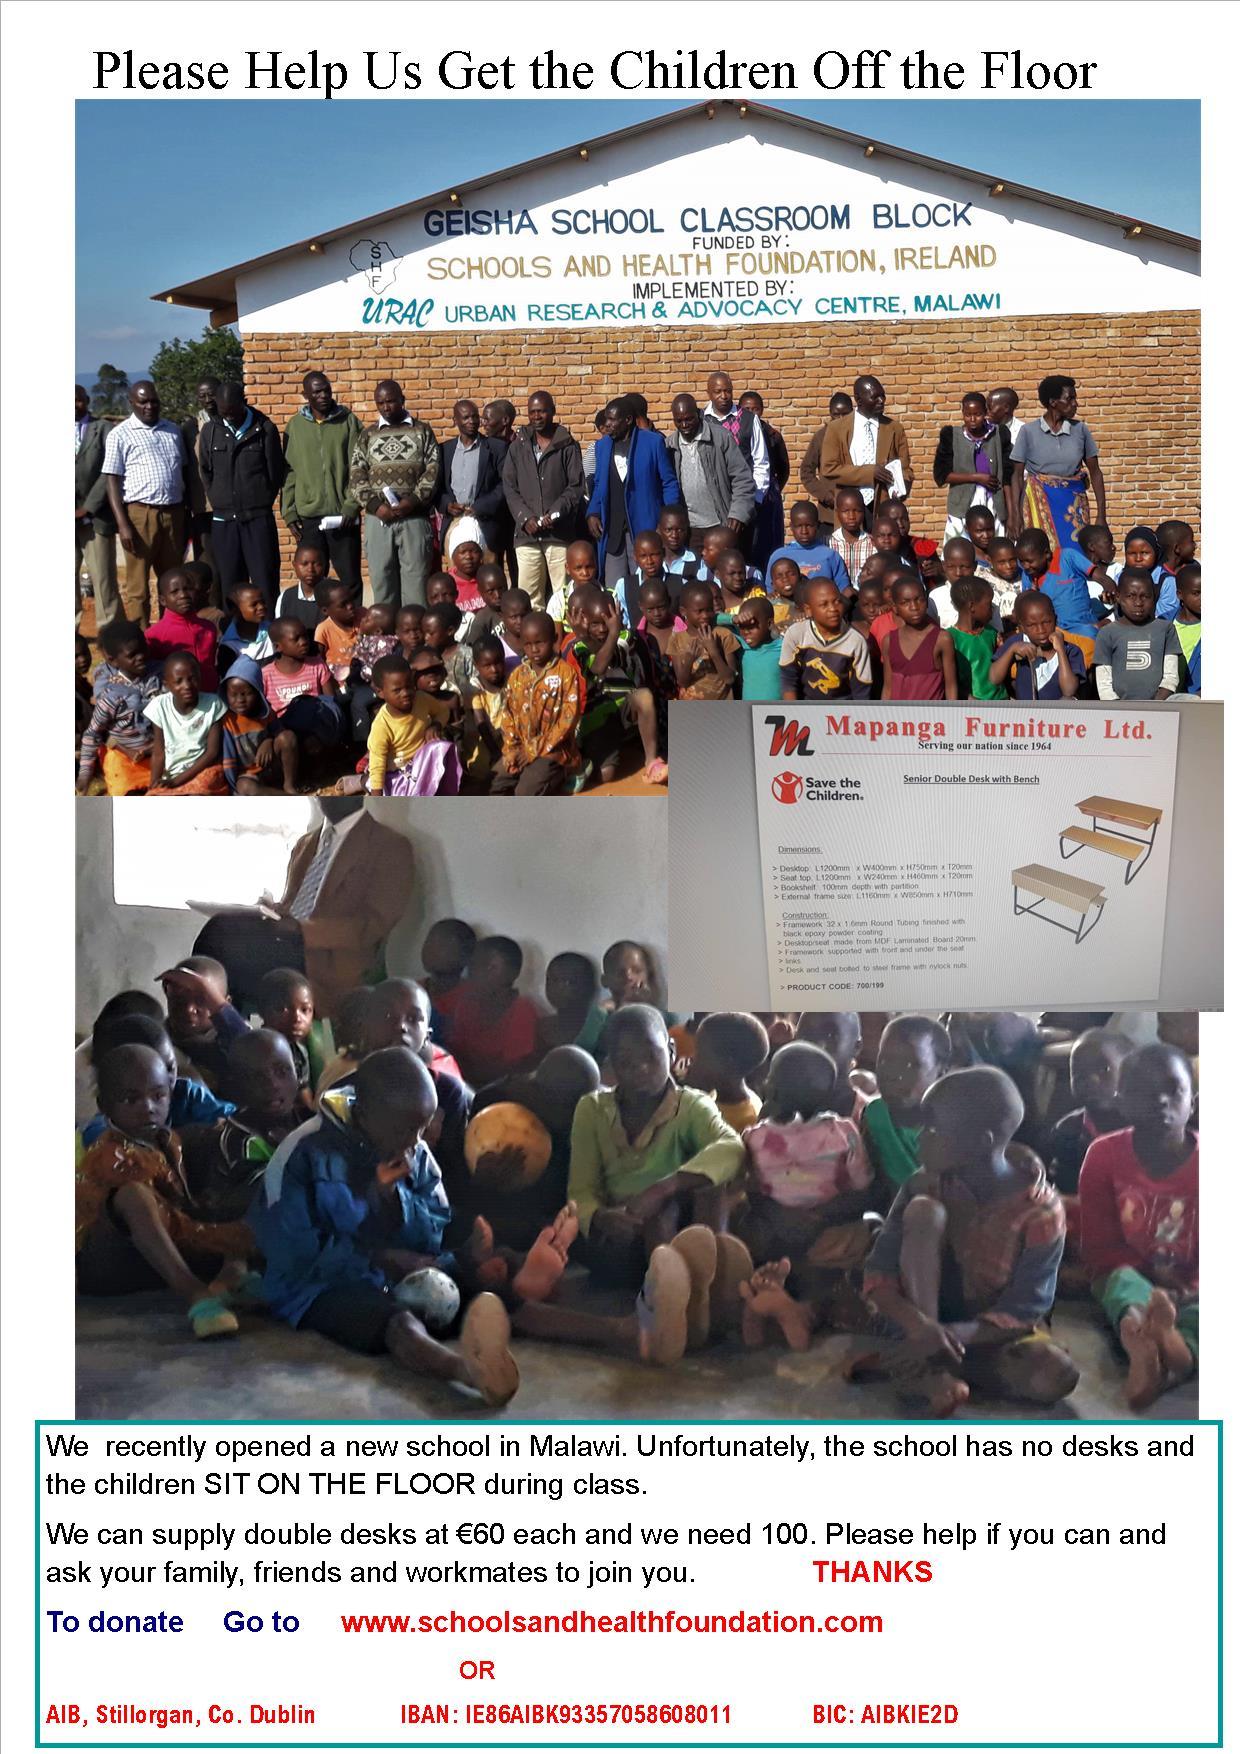 Malawi Desks